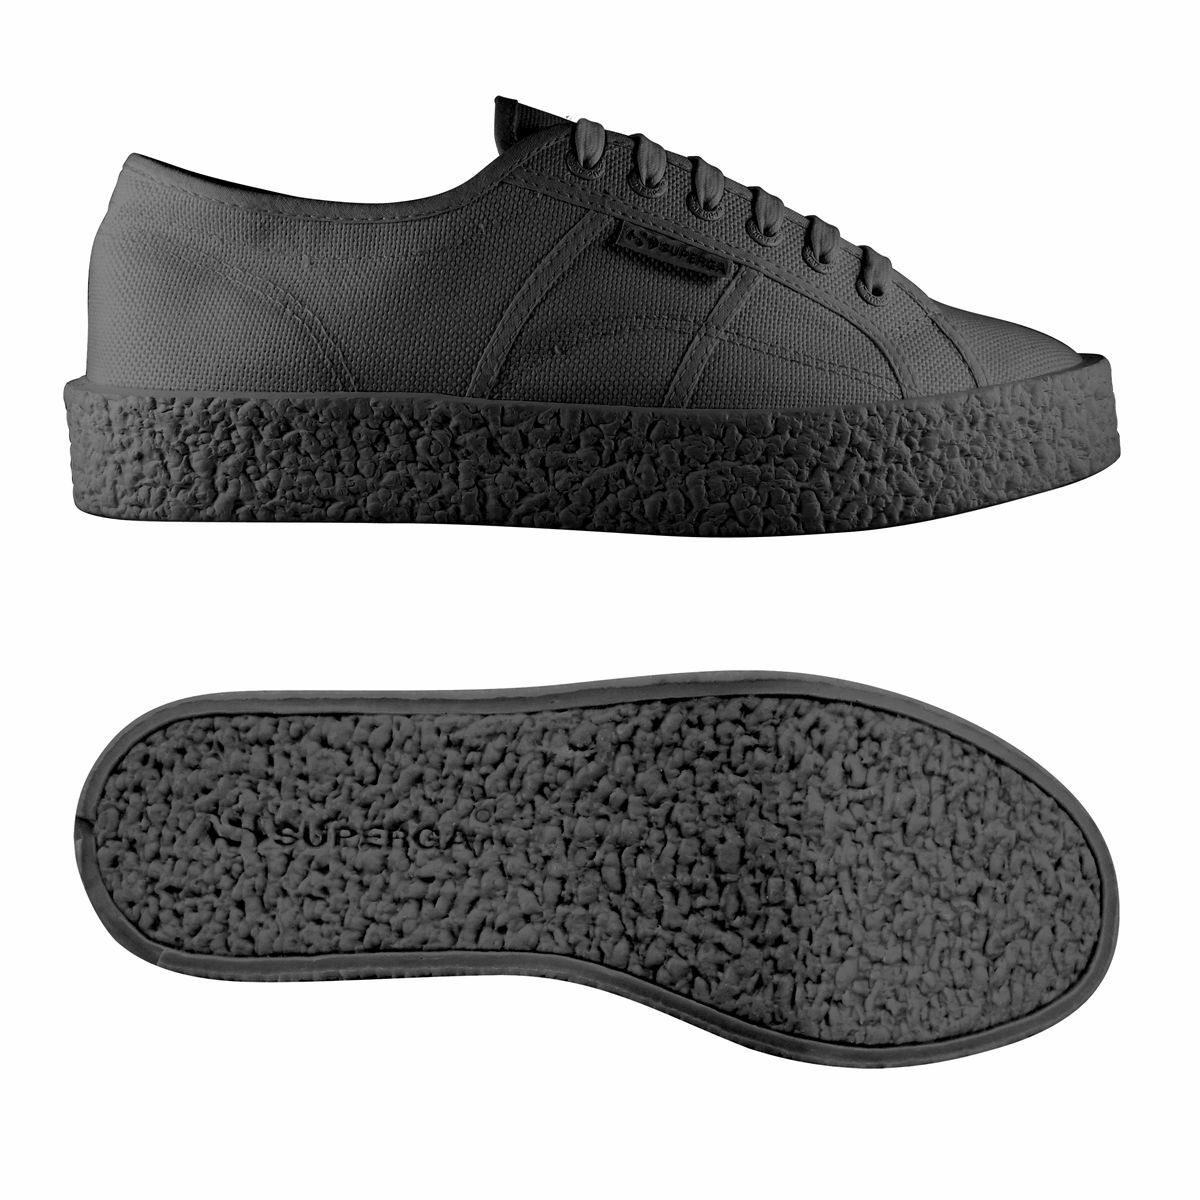 SUPERGA SCHUHE 2750 MEGA DANILO PAURA Schuhe NERO Schuhe ZAPATOS SCHUHE SUPERGA CHAUSSURES 4d77e6